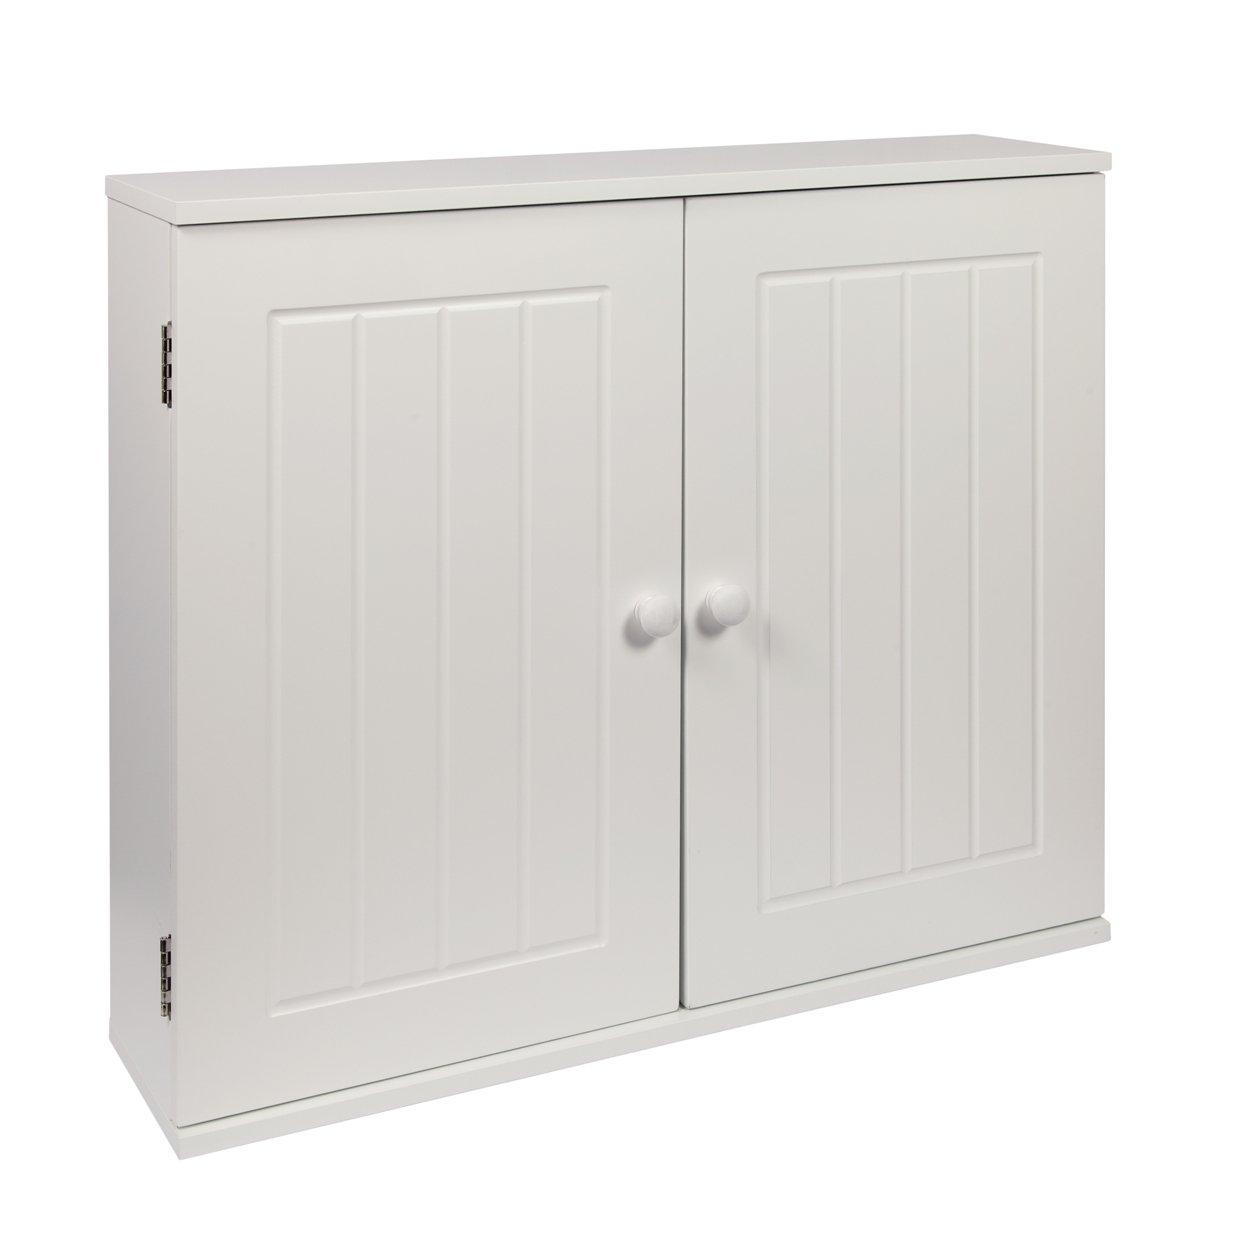 Wood 50x60x15 cm 50 x 60 x 15cm woodluv MDF White Double Wall Cabinet Cupboard Storage Unit